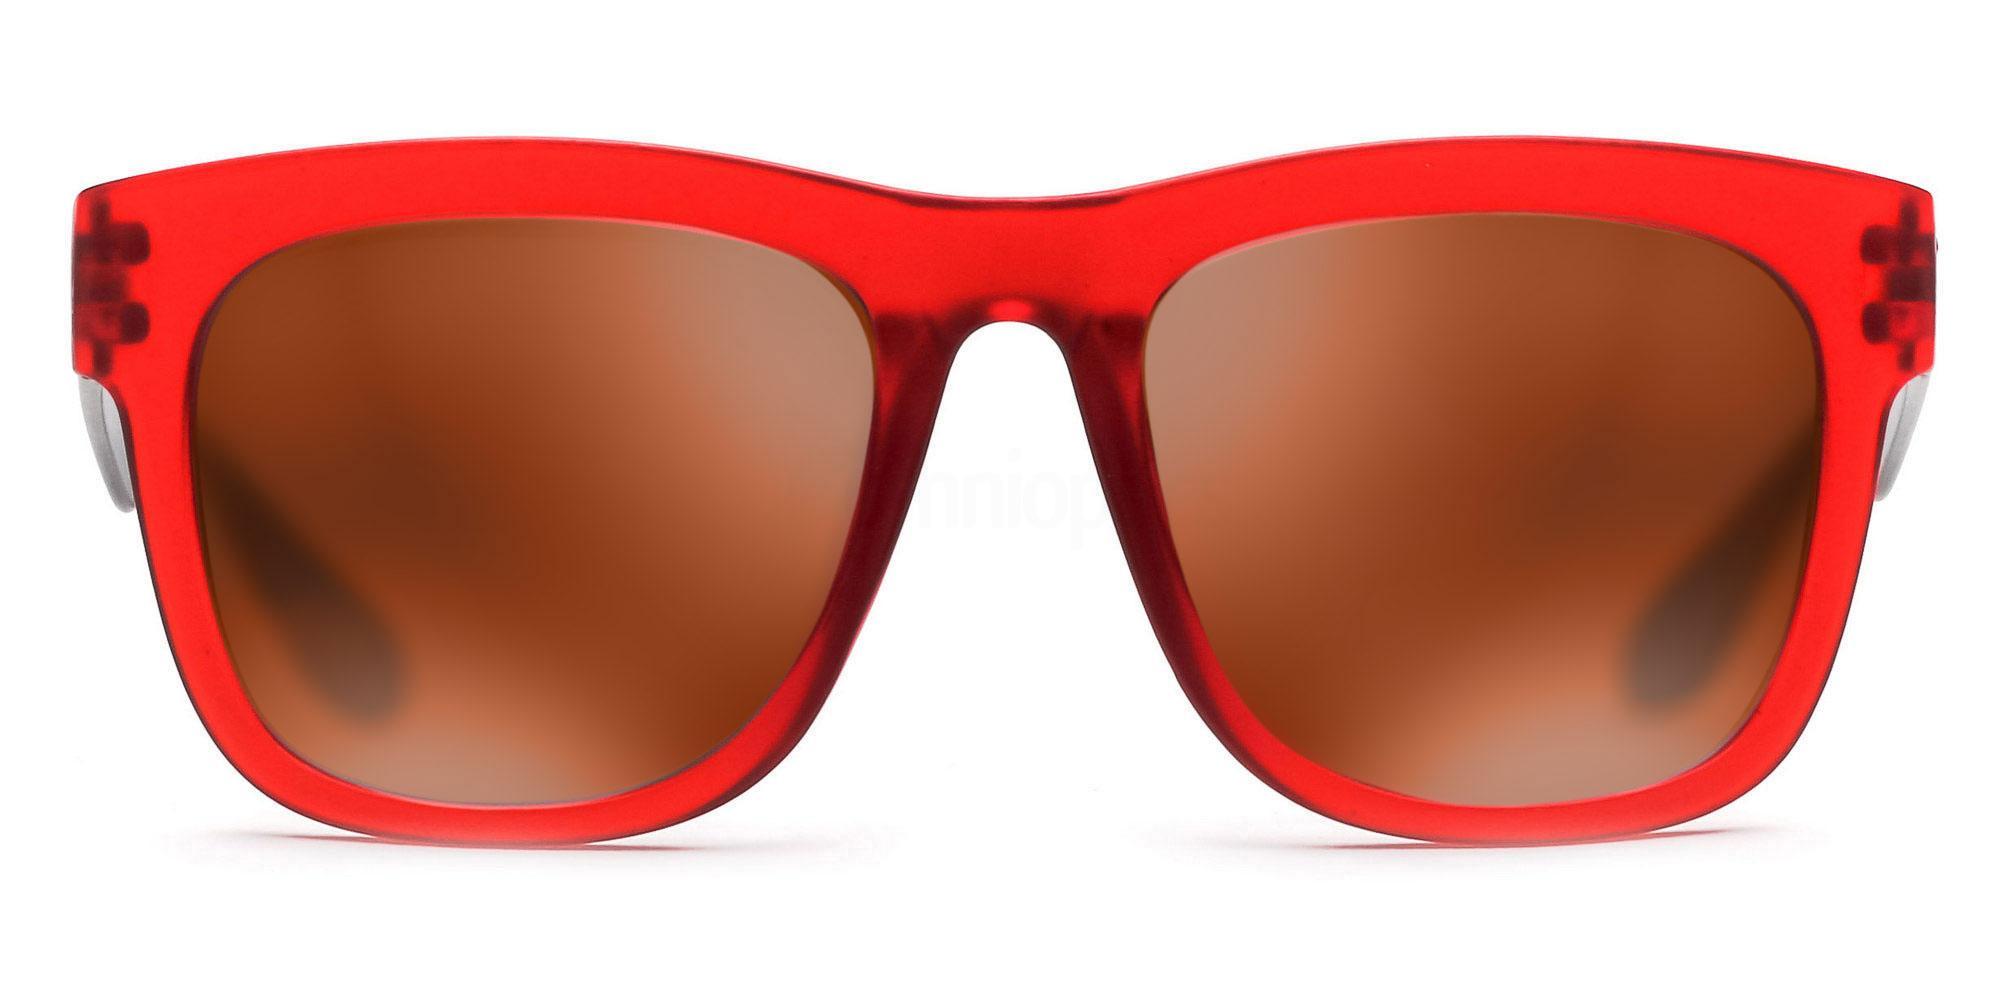 C157 S9199 Sunglasses, Savannah